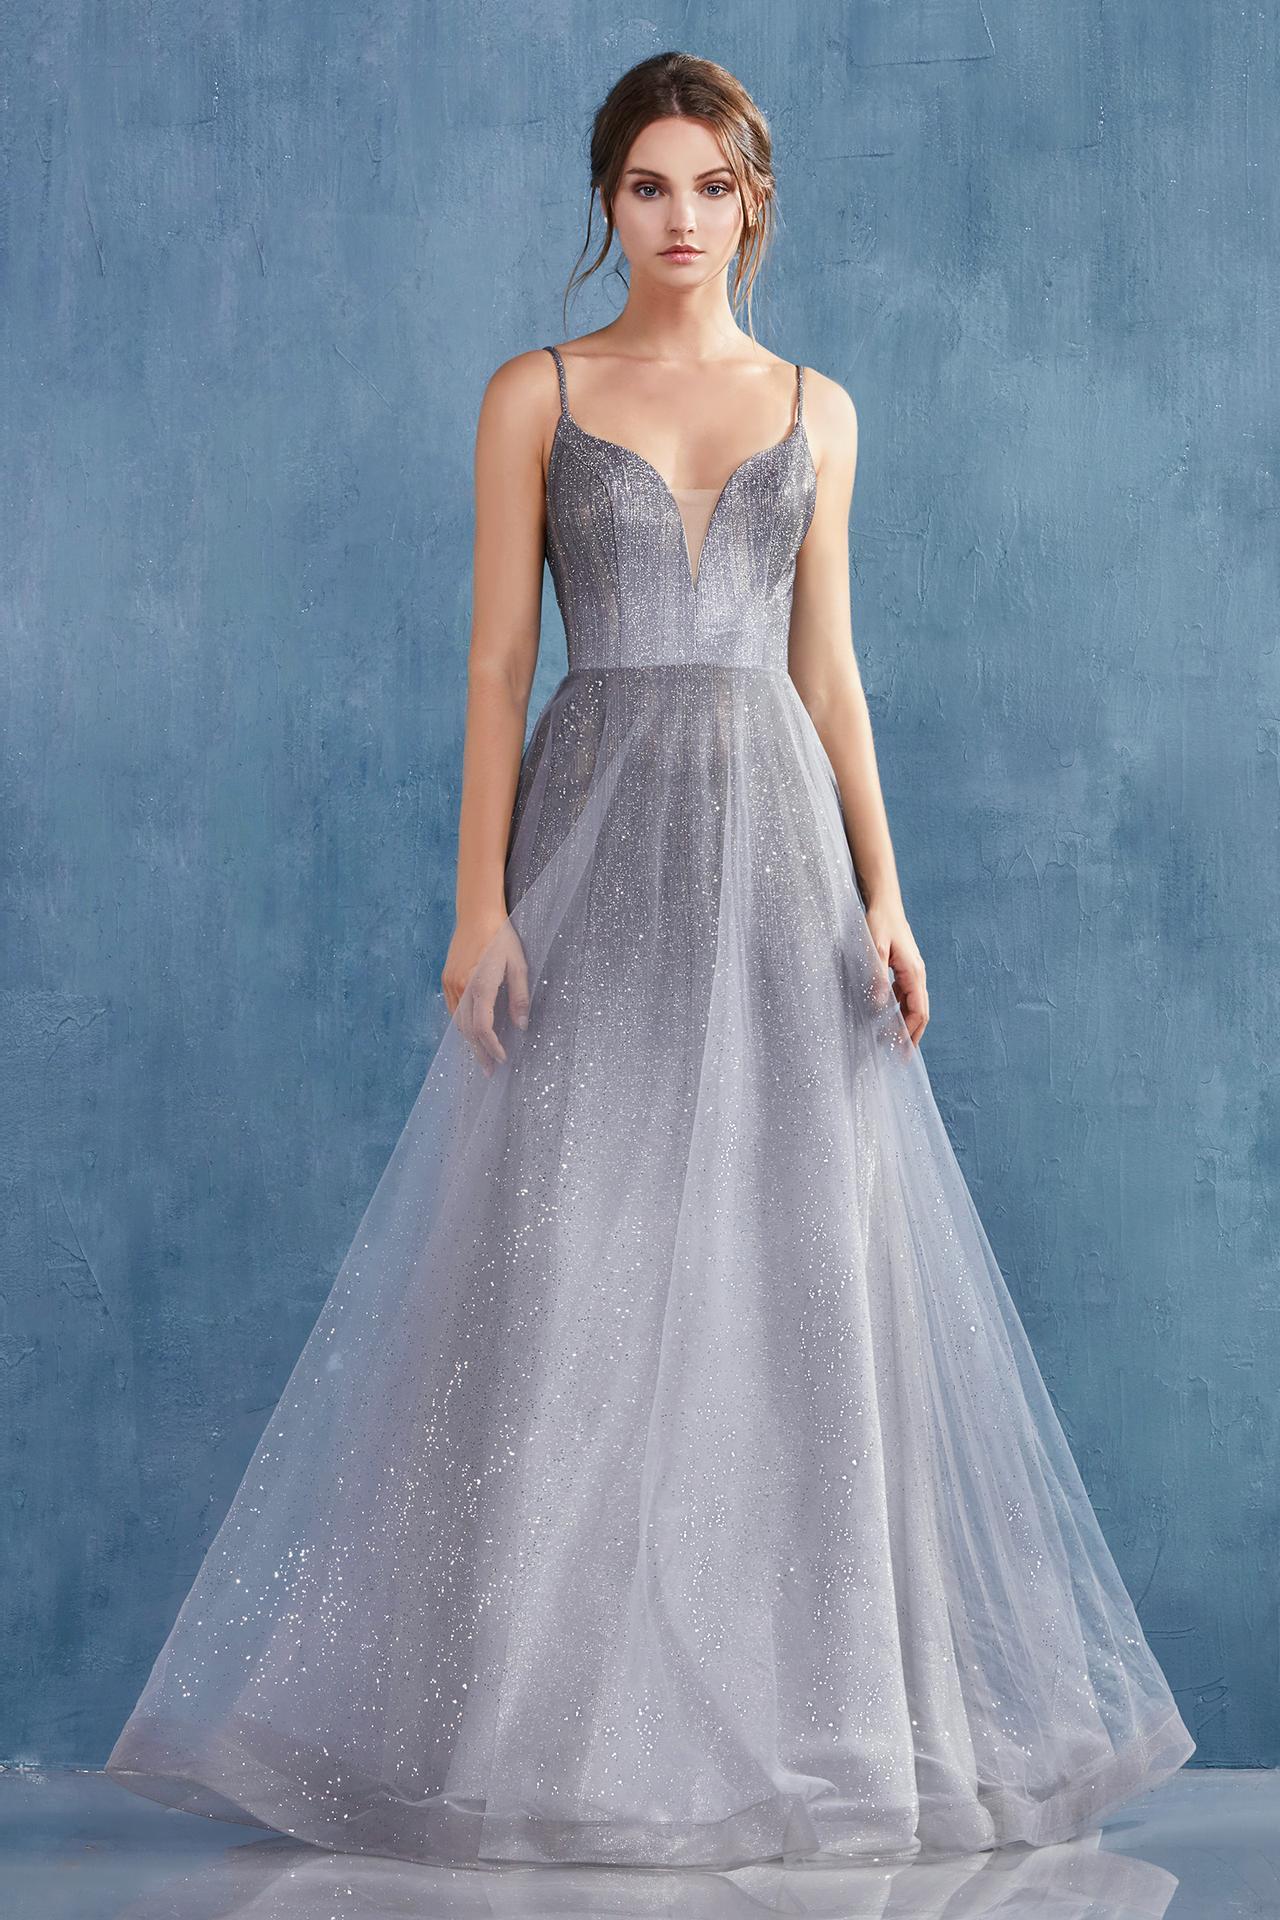 Nové spoločenské šaty :) - Obrázok č. 61